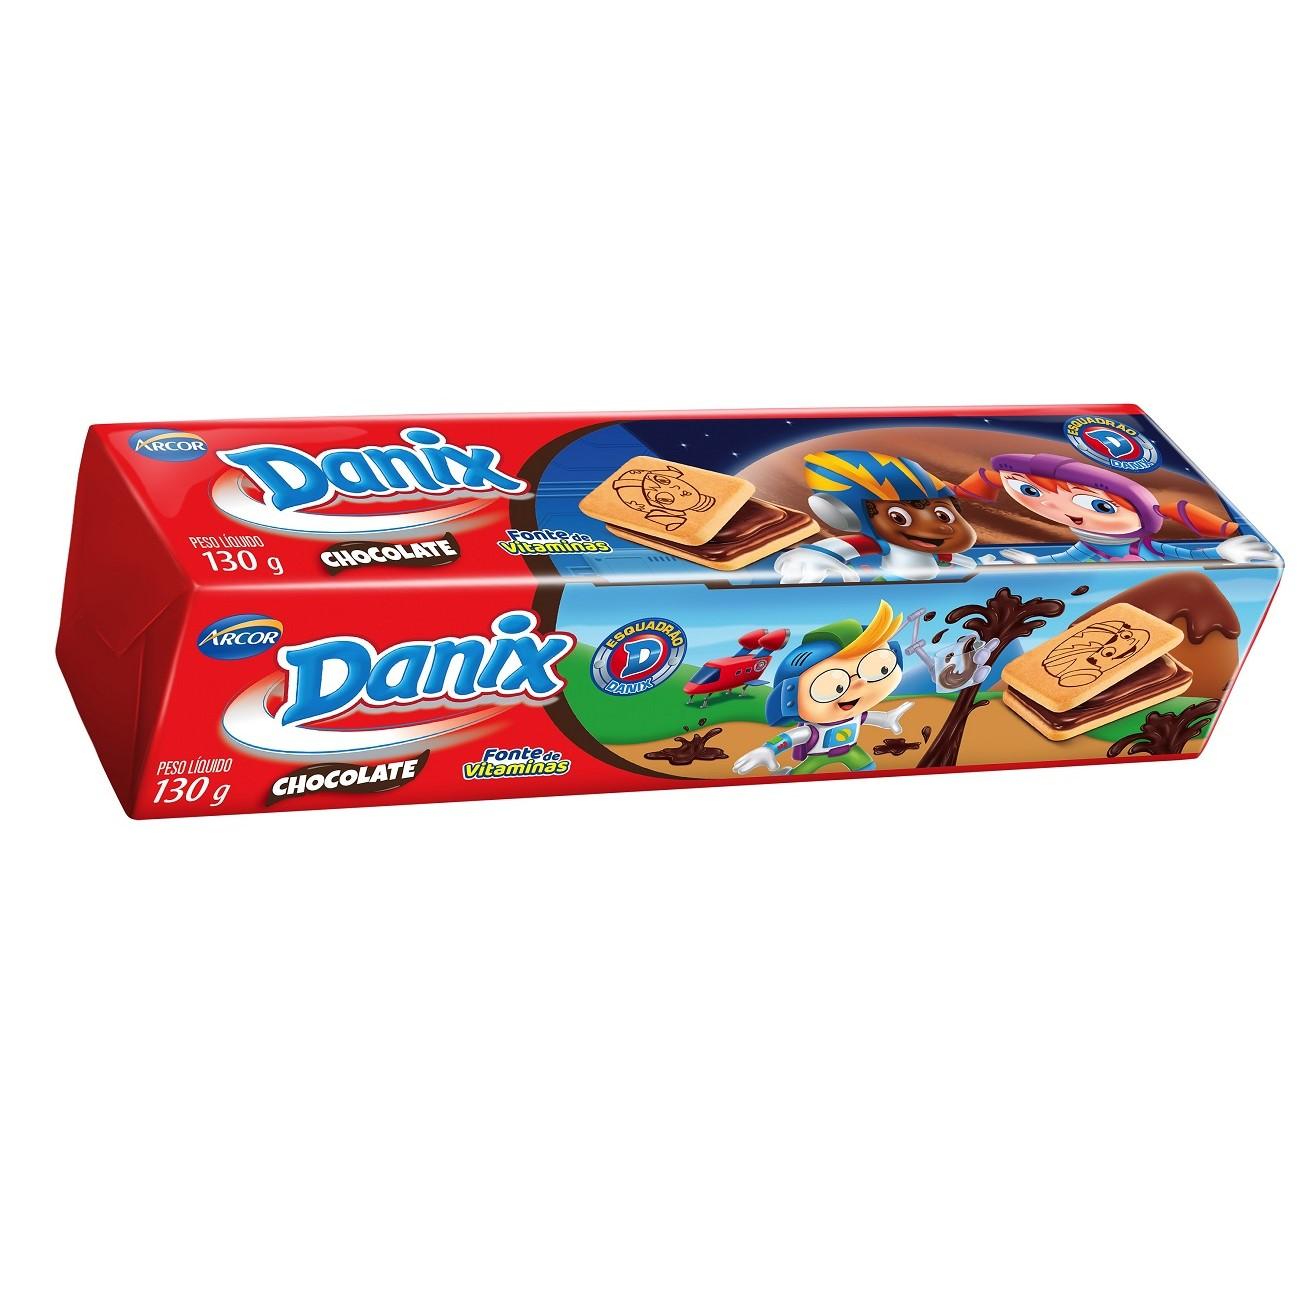 Biscoito Danix Recheado Chocolate Patrulha Canina 130g